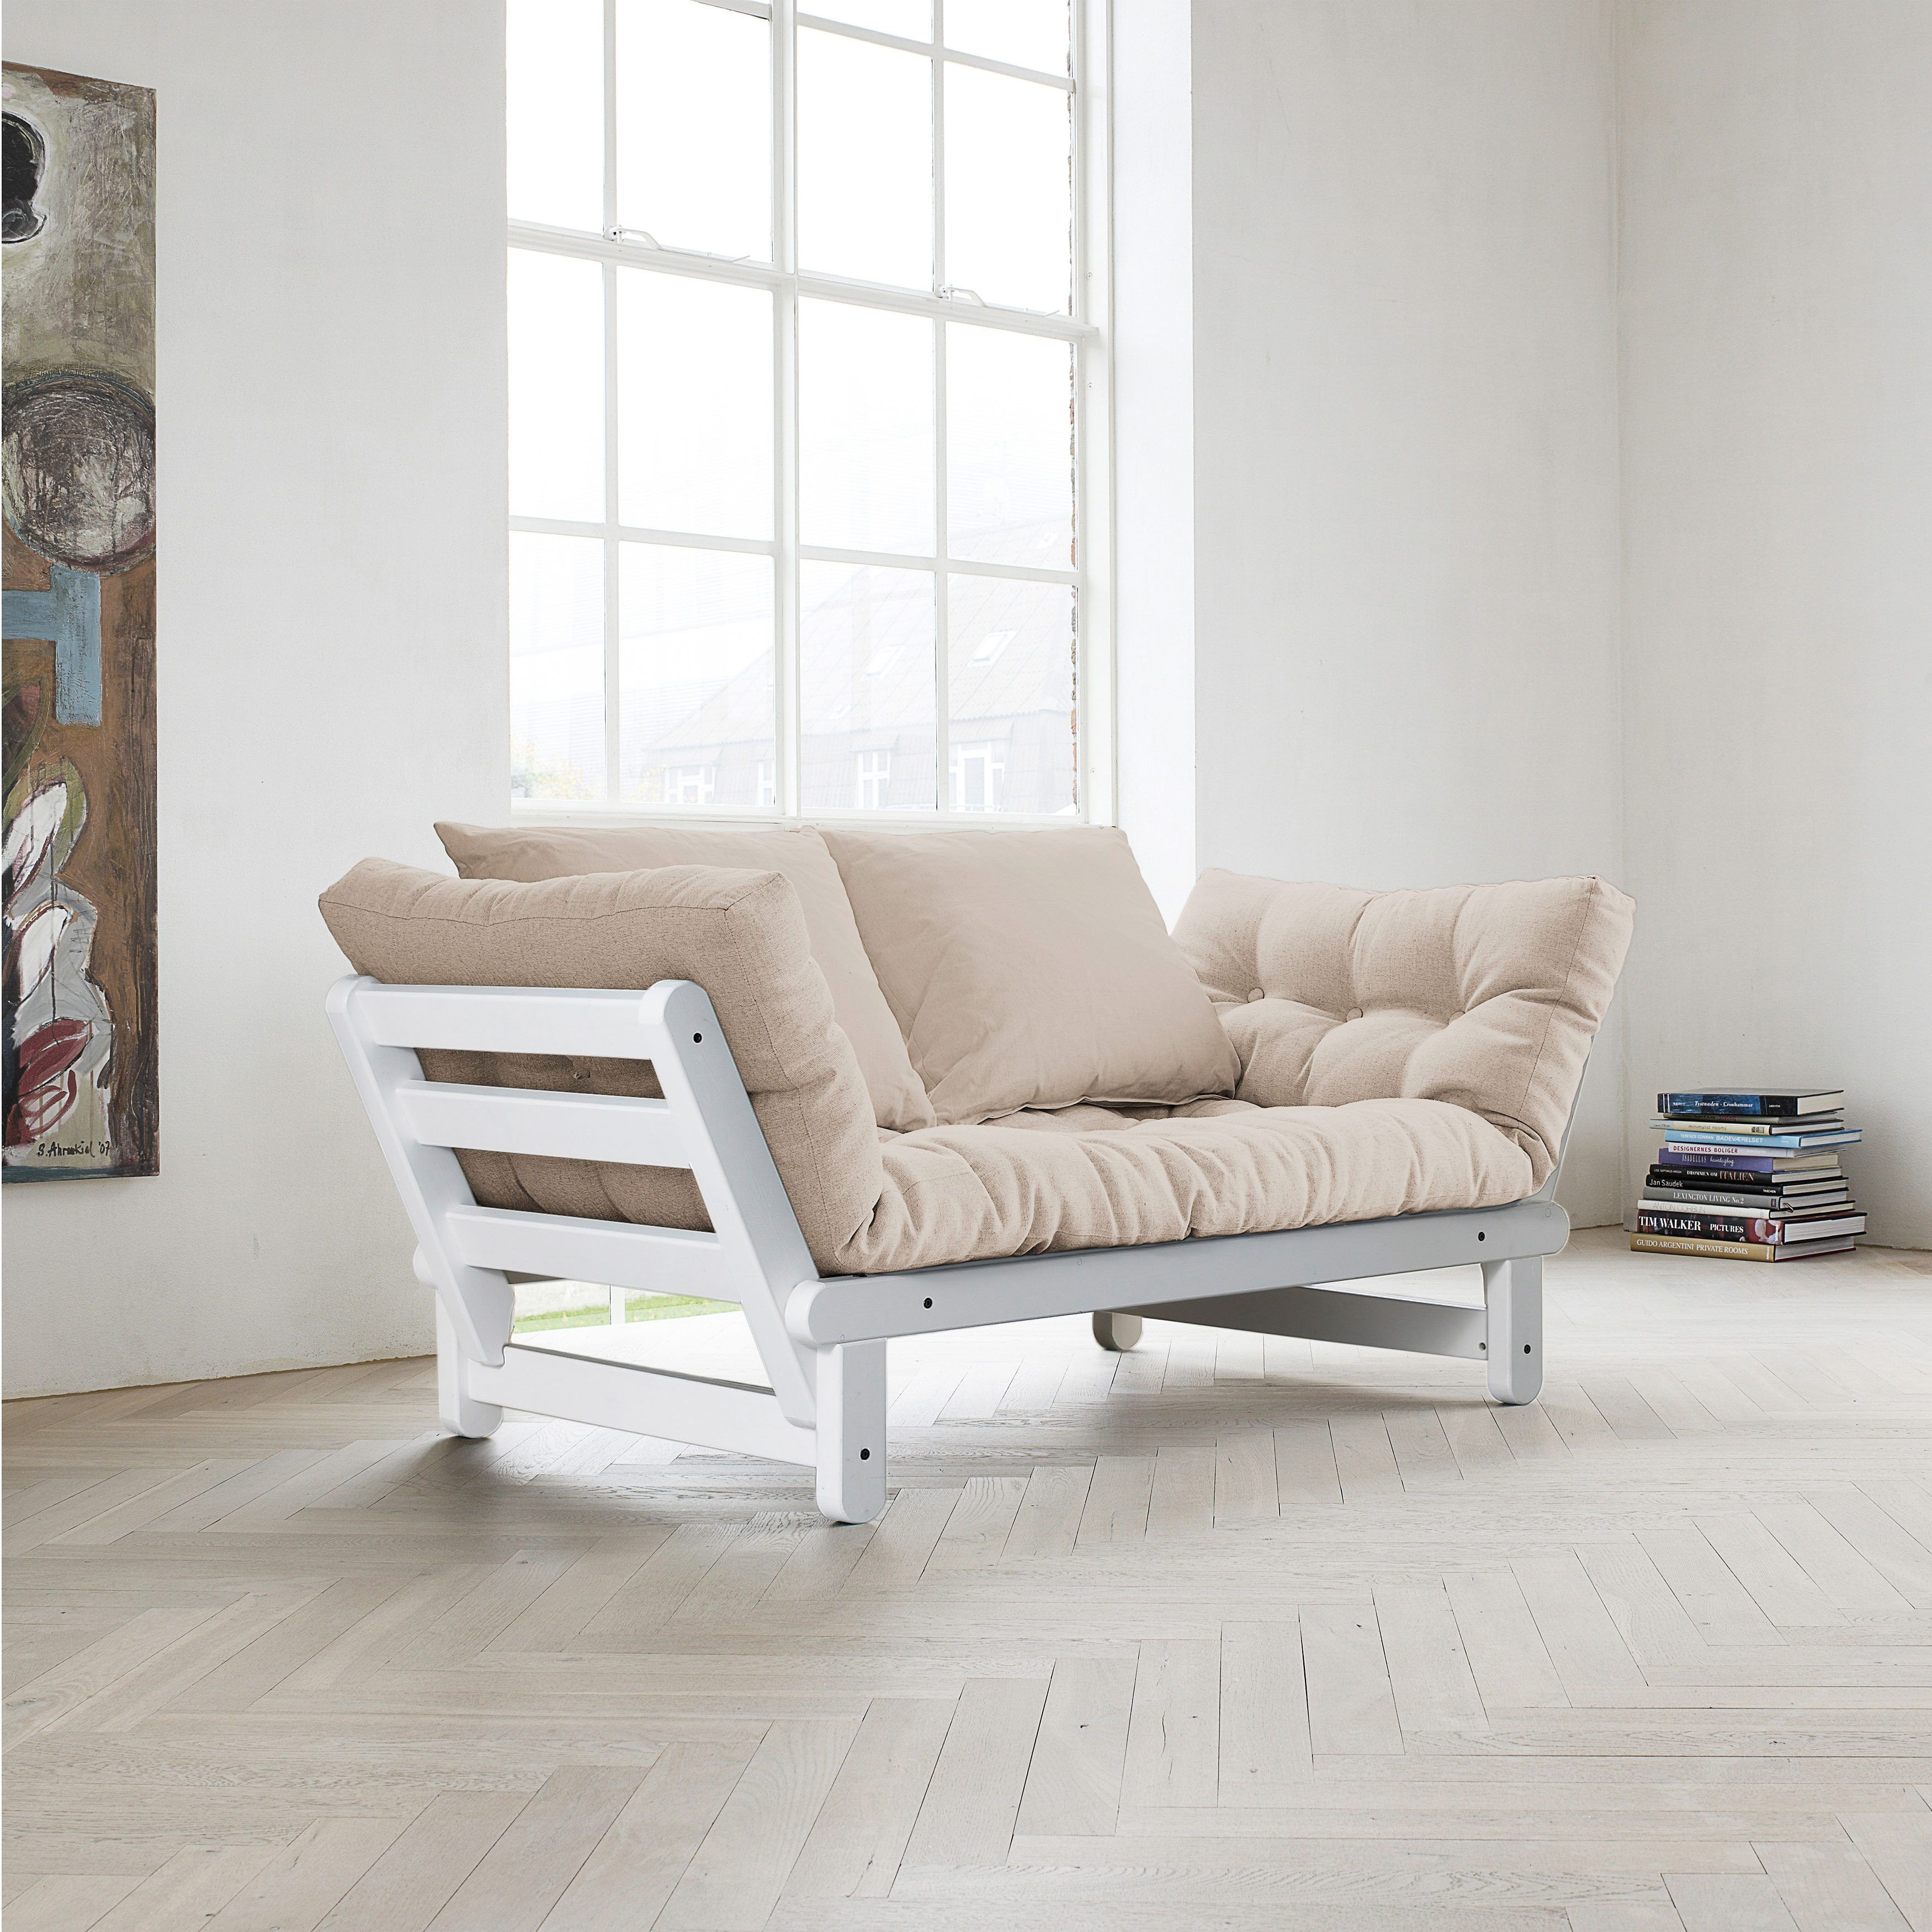 Schlafsofa karup jetzt bestellen unter httpsmoebel explore futon sofa bed boat bed and more parisarafo Choice Image